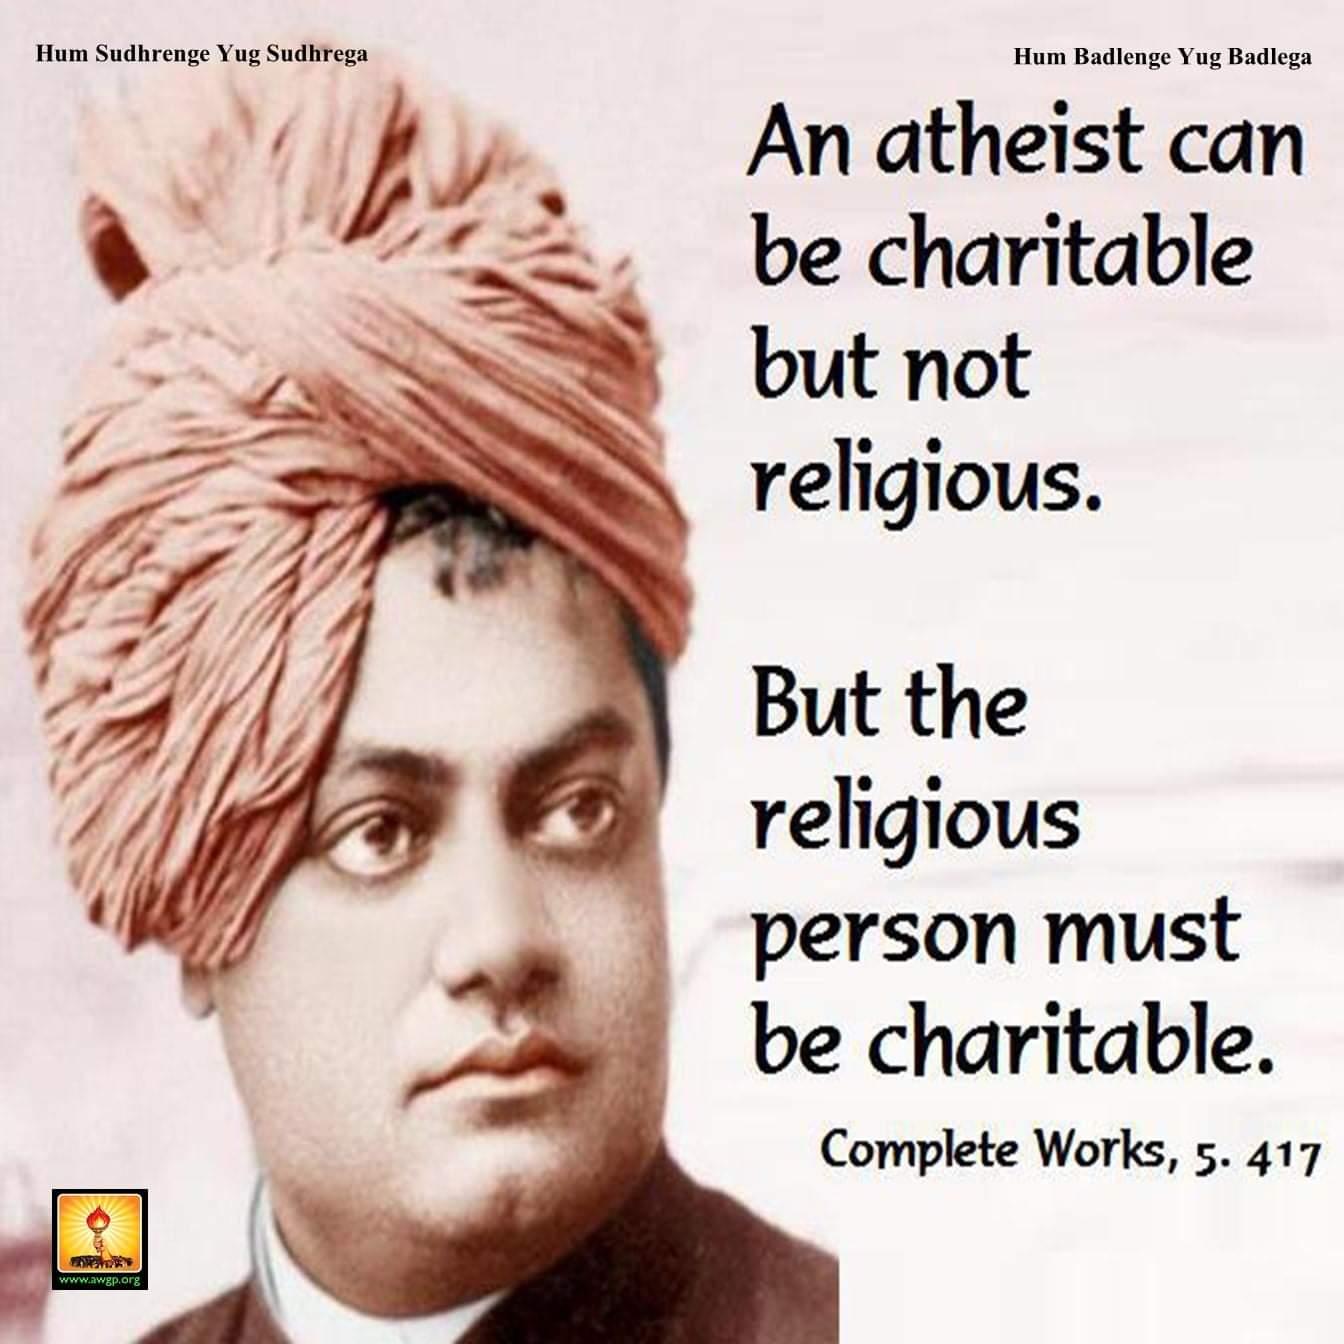 Hum Sudhrenge Yug Sudhrega Hum Badlenge Yug Badlega An atheist can be charitable butnot religious. But the religious person must be charitable. Complete Works, 5. 417 https://inspirational.ly